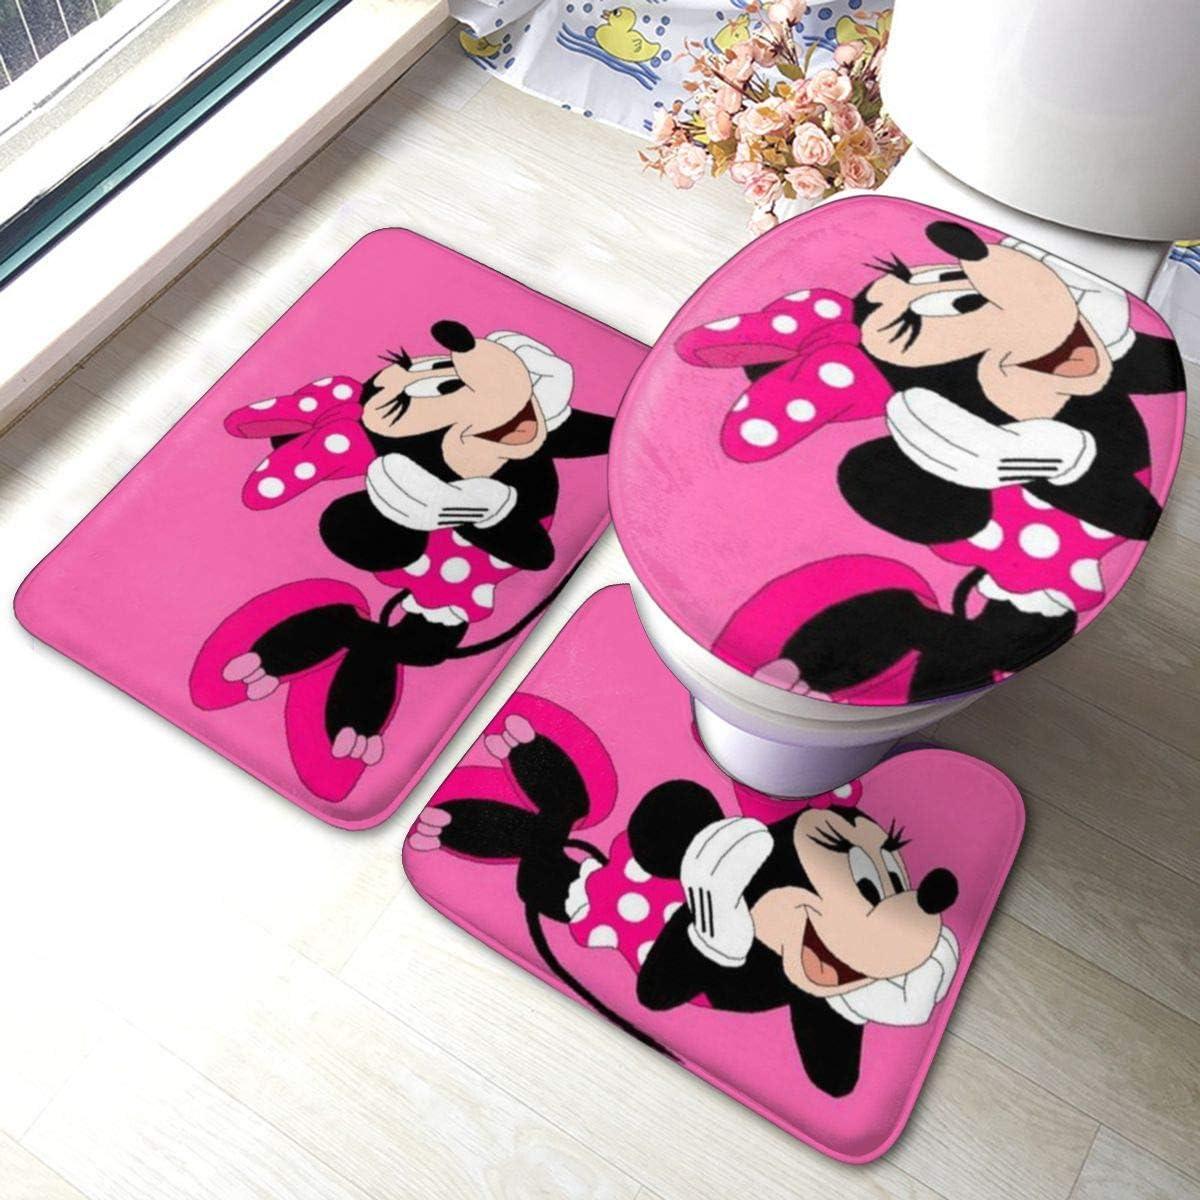 Happy Minnie Mouse Bathroom Rug, Non Slip Bath Mat + U-Shaped Contour Rug + Toilet Lid Cover Set 3 Piece